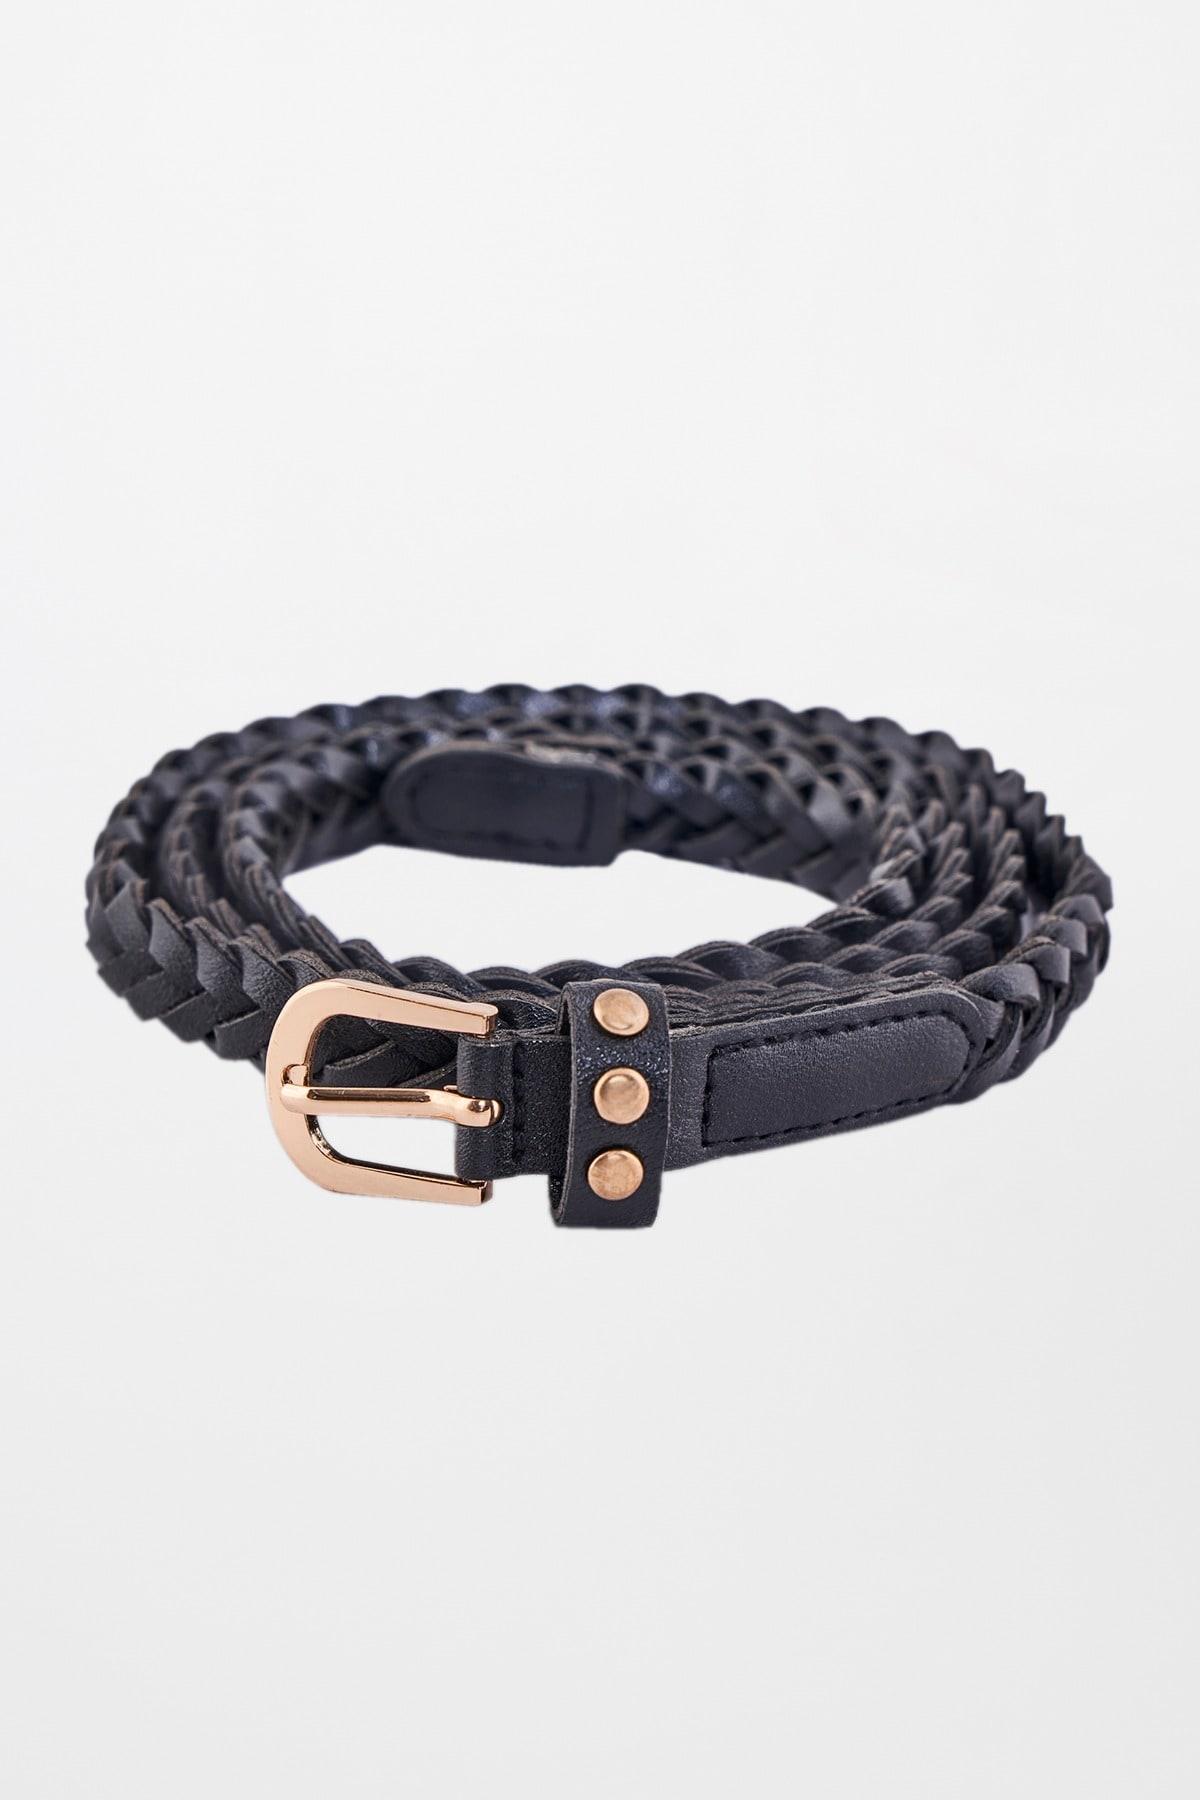 AND | Black Braided Belt